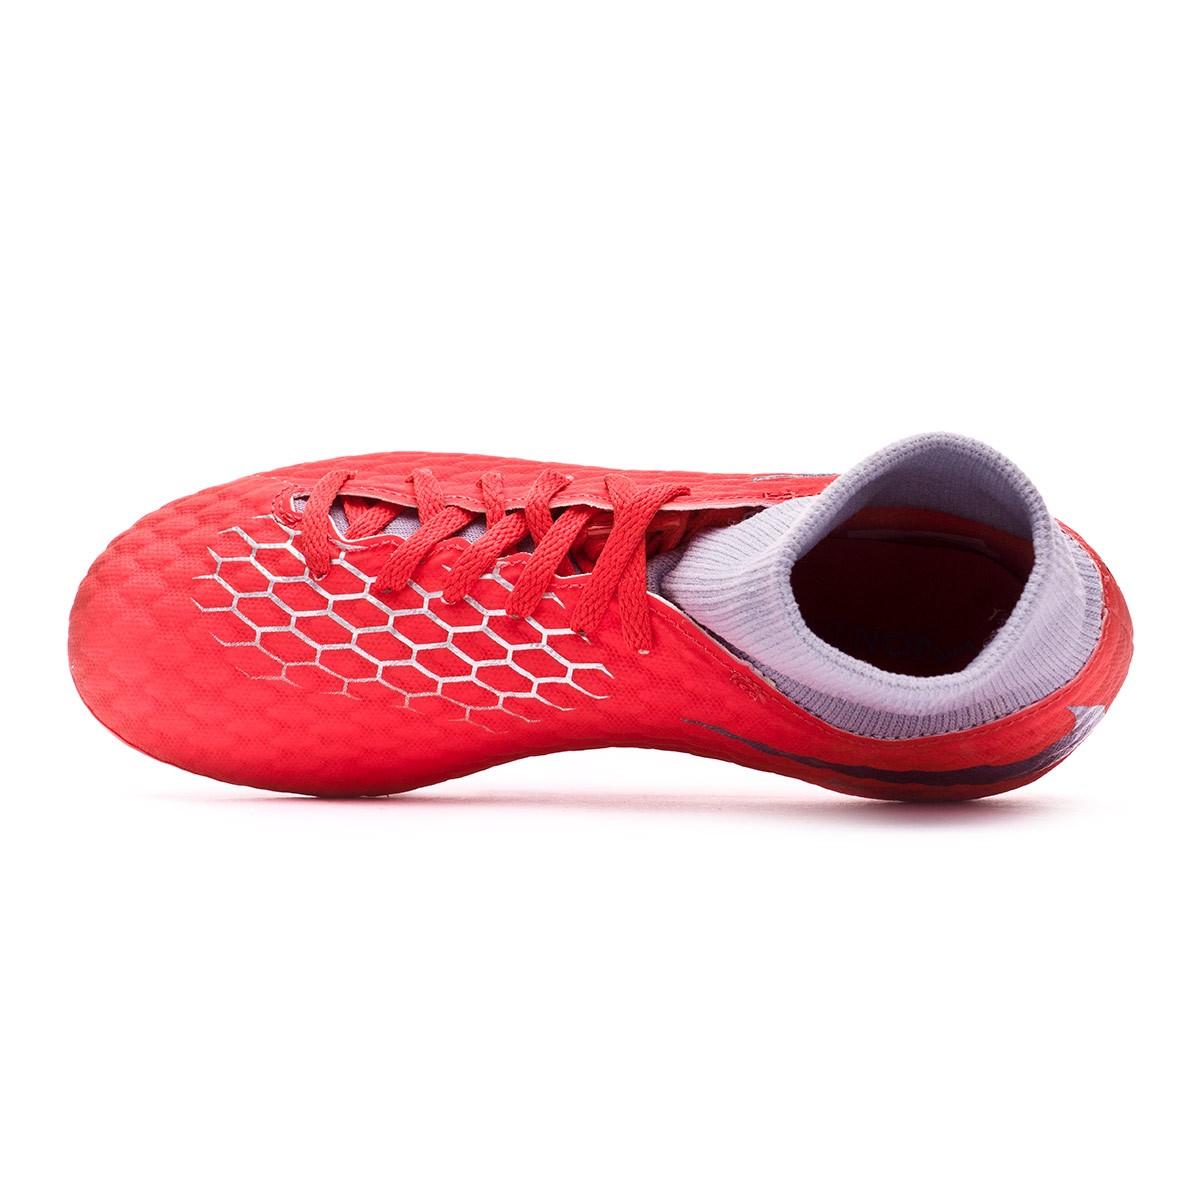 221982fbb544 Boot Nike Hypervenom Phantom III Academy DF AG-Pro Niño Light crimson-Metallic  dark grey-Wolf grey - Leaked soccer